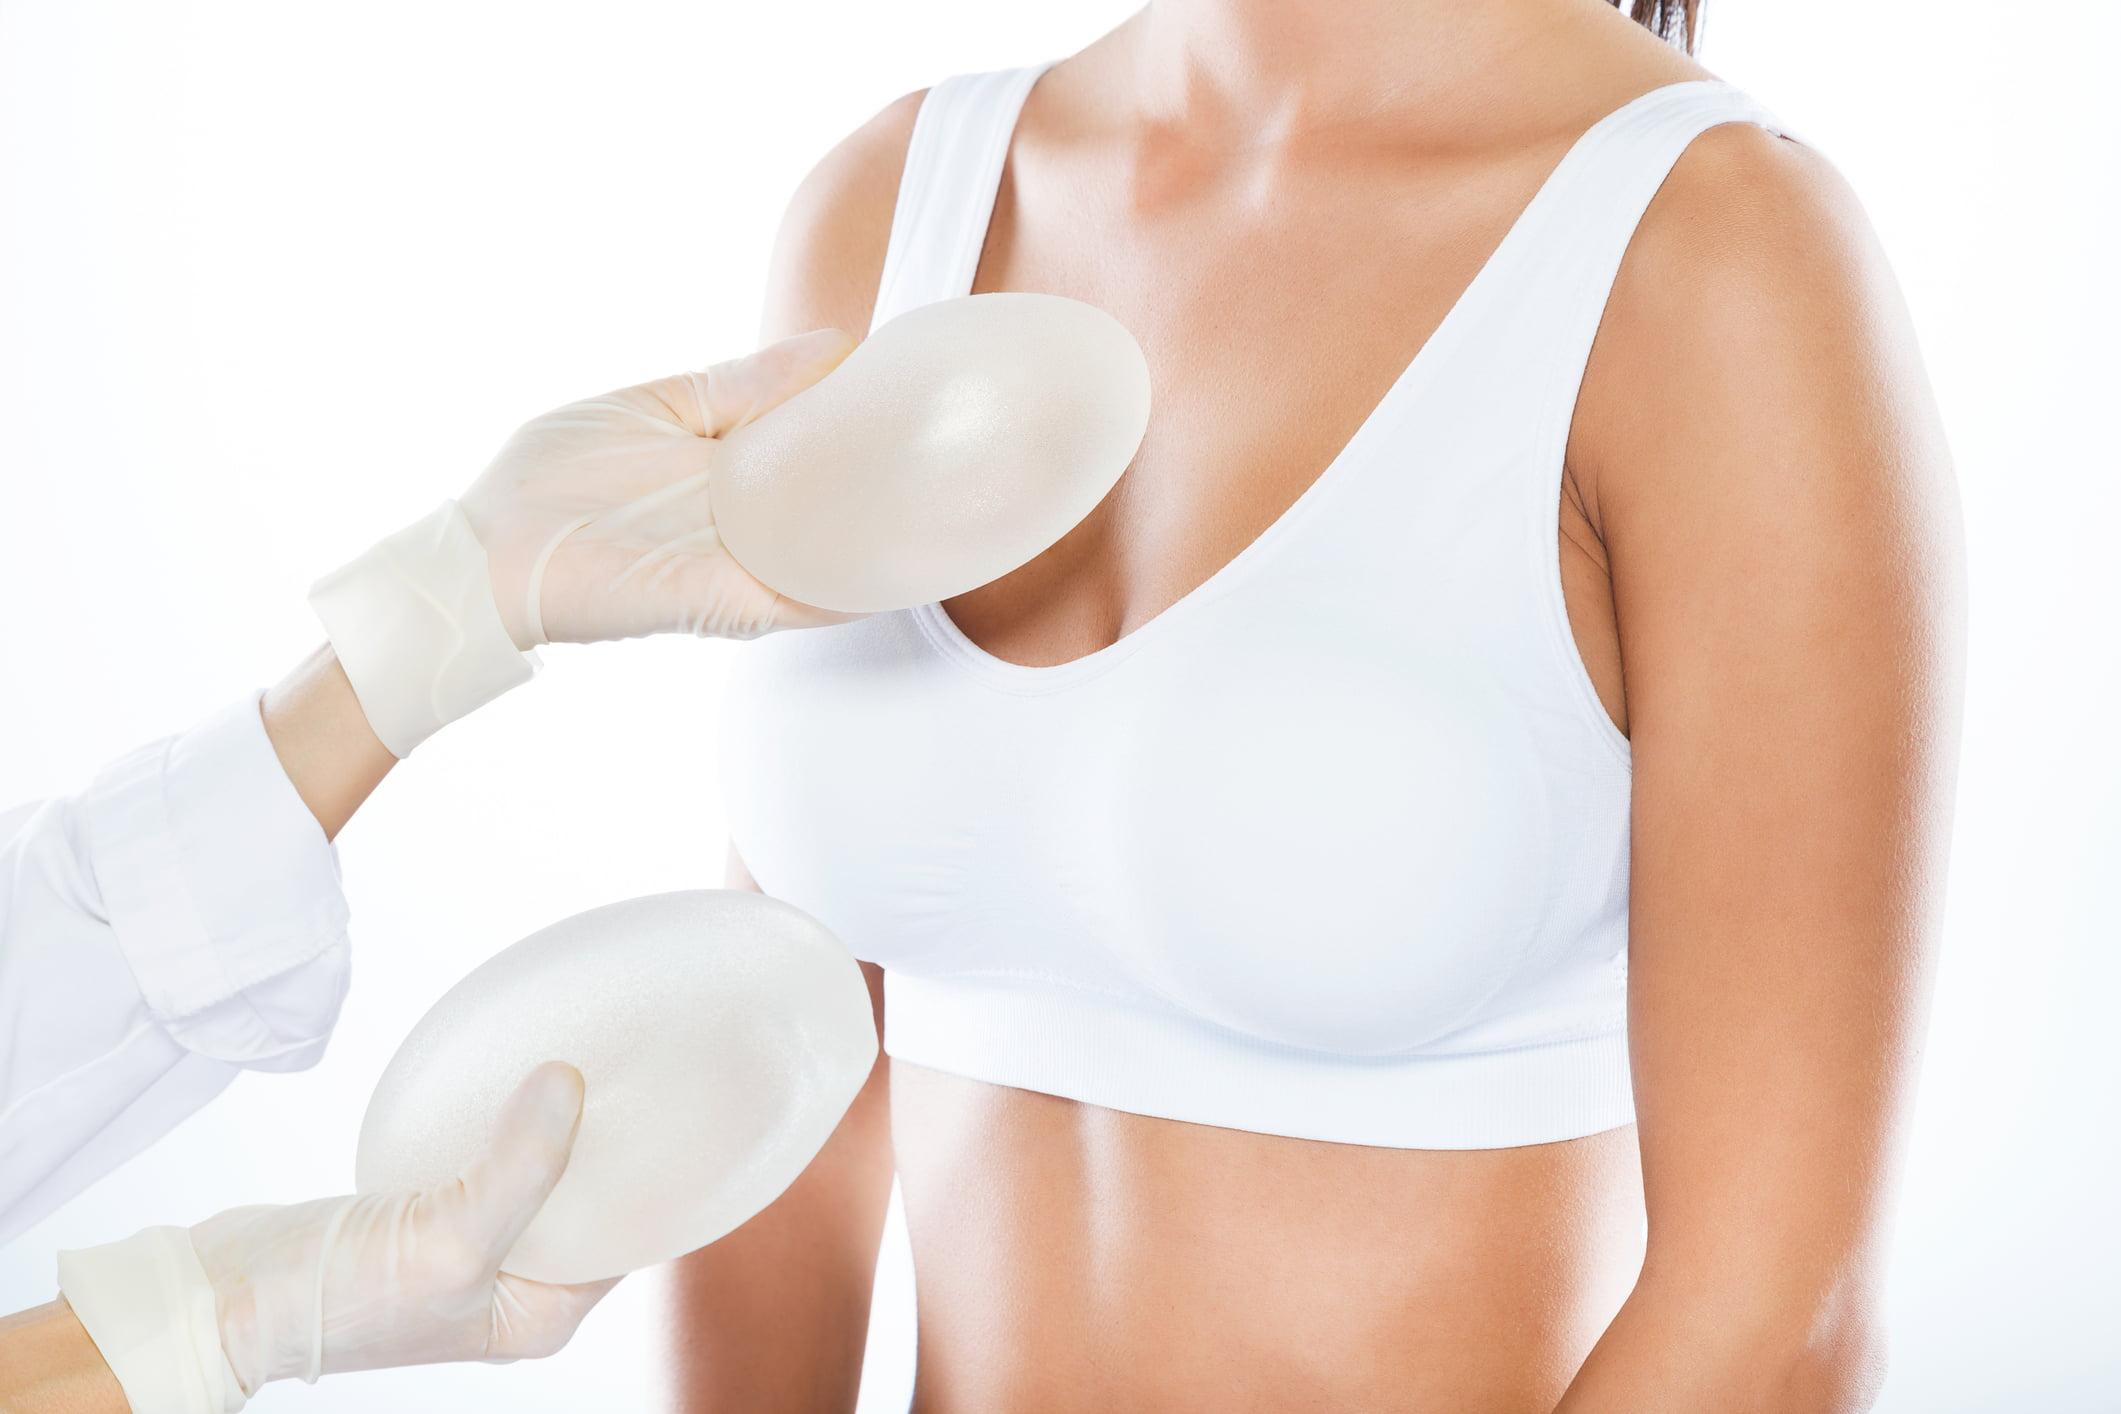 Breast Augmentation Surgery Zty Health Turkey